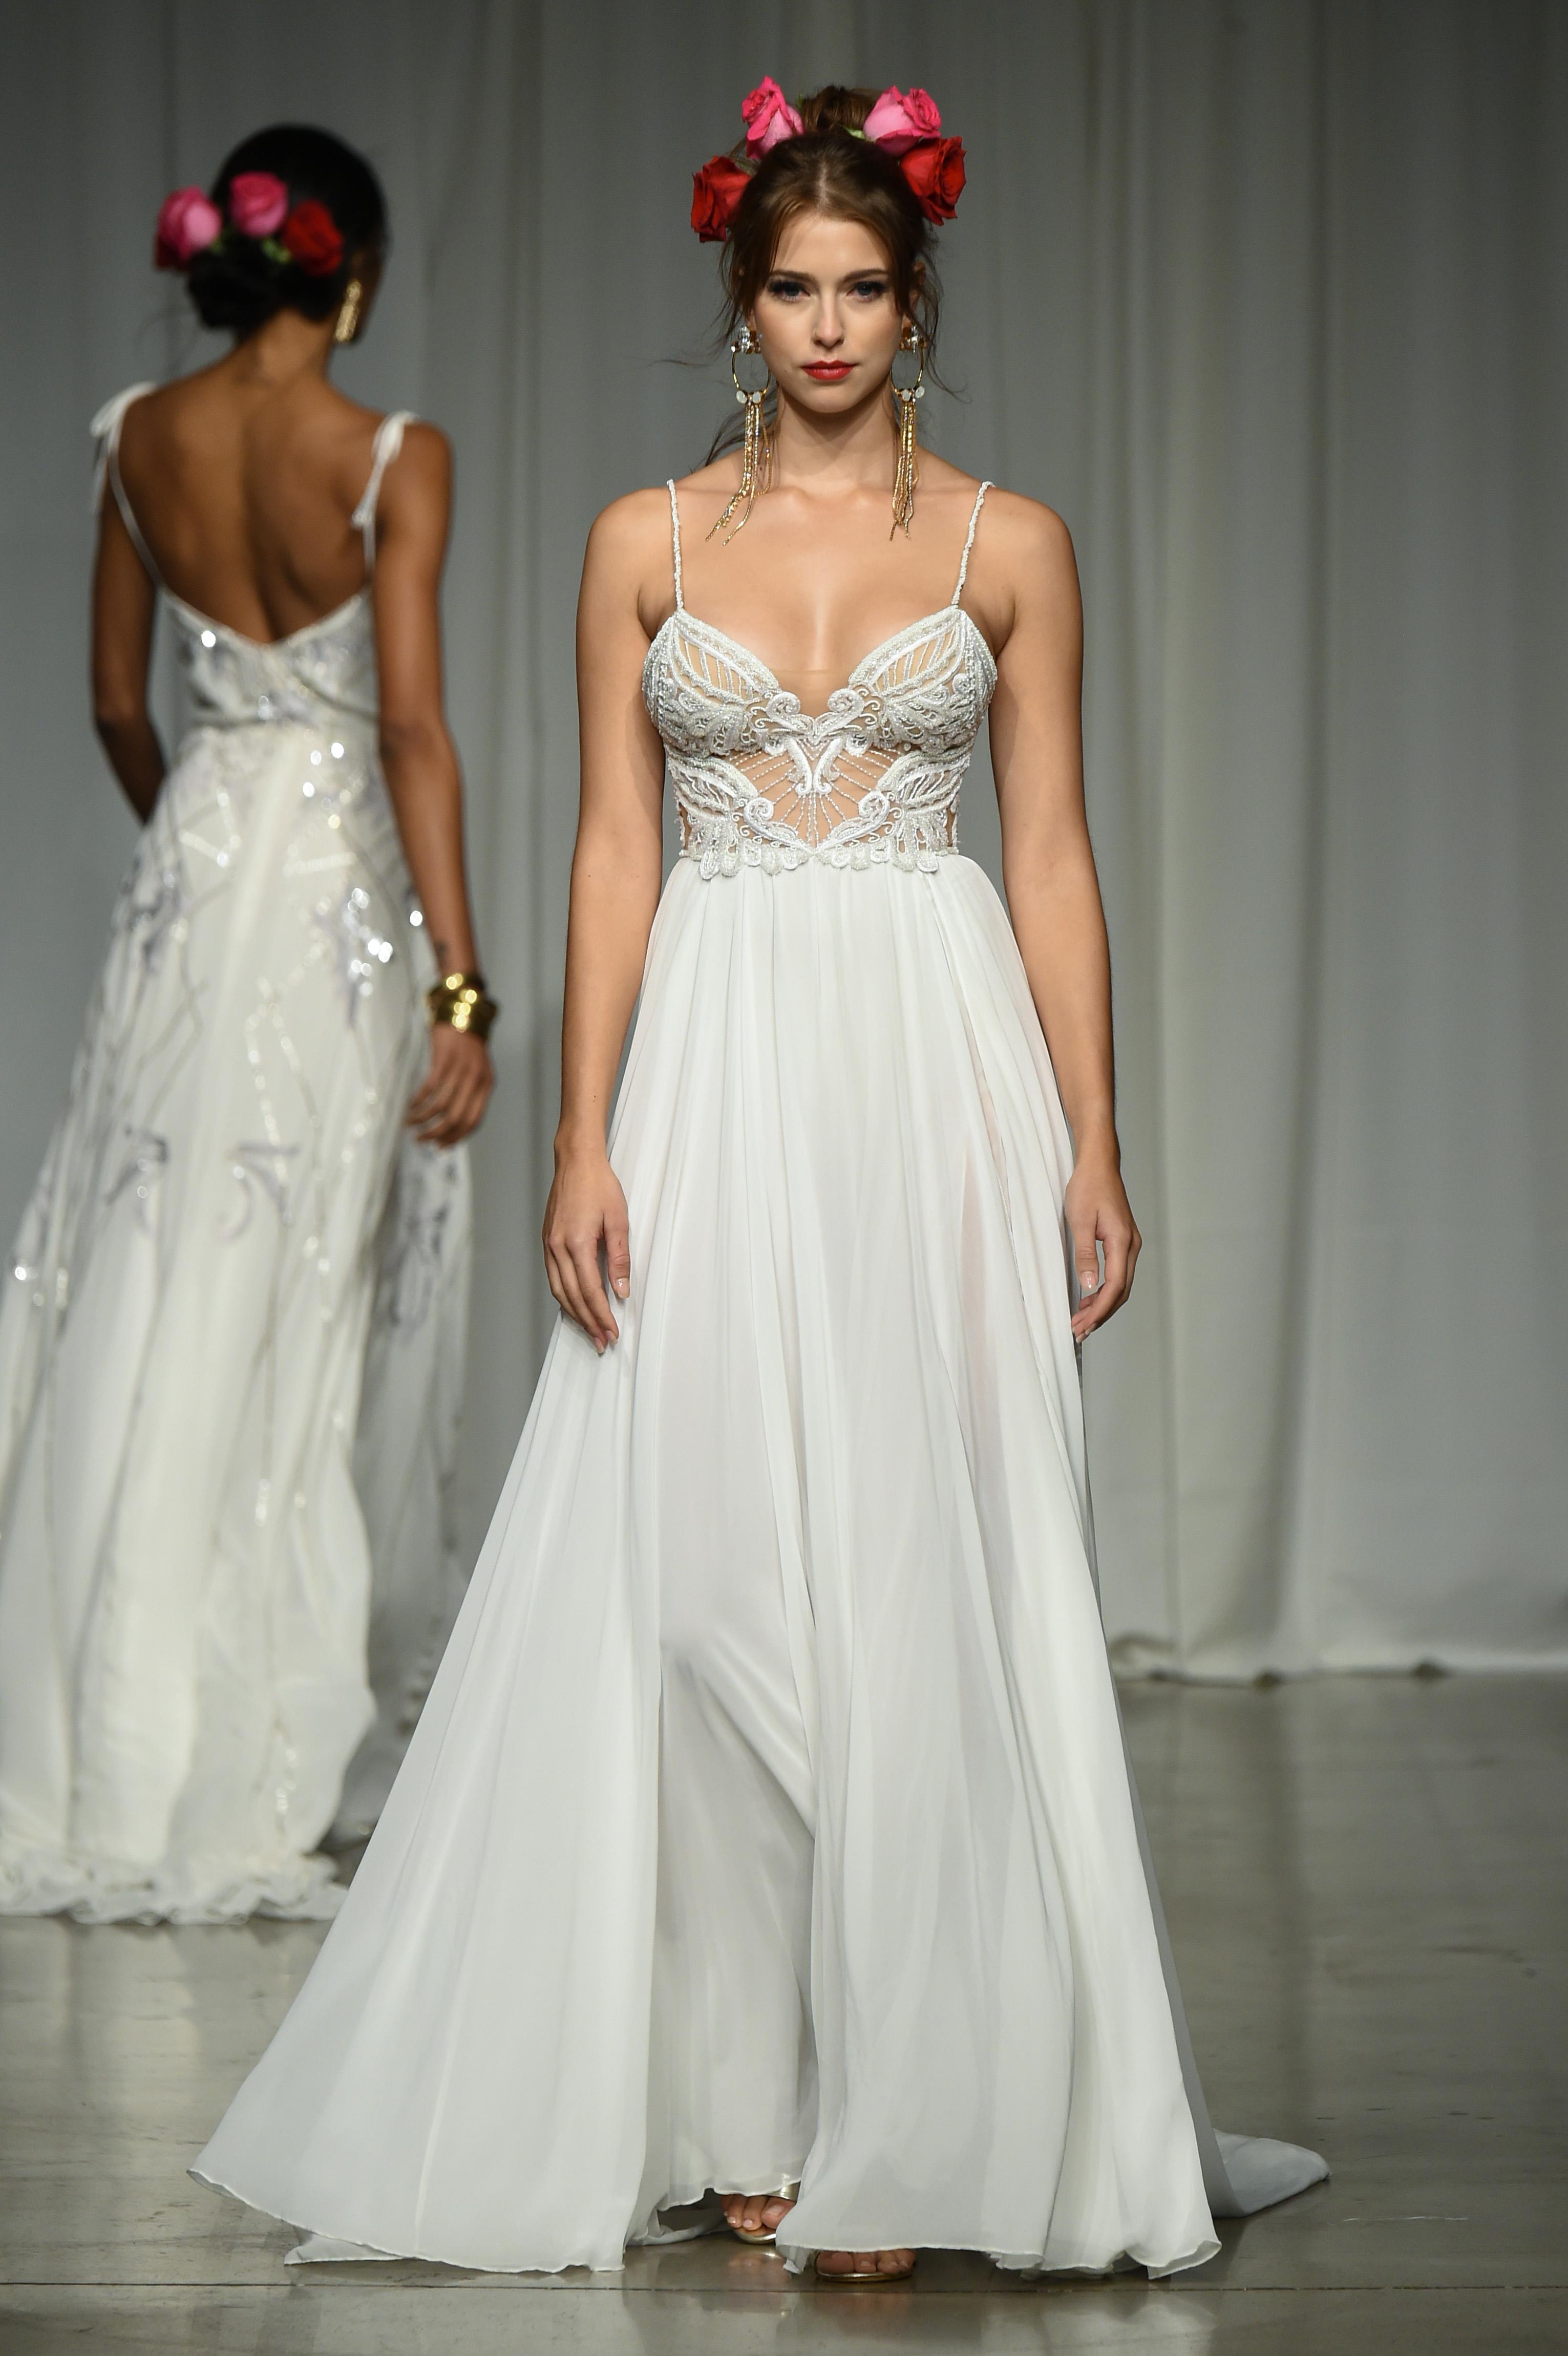 julie vino group fall 2019 a-line spaghetti strap wedding dress